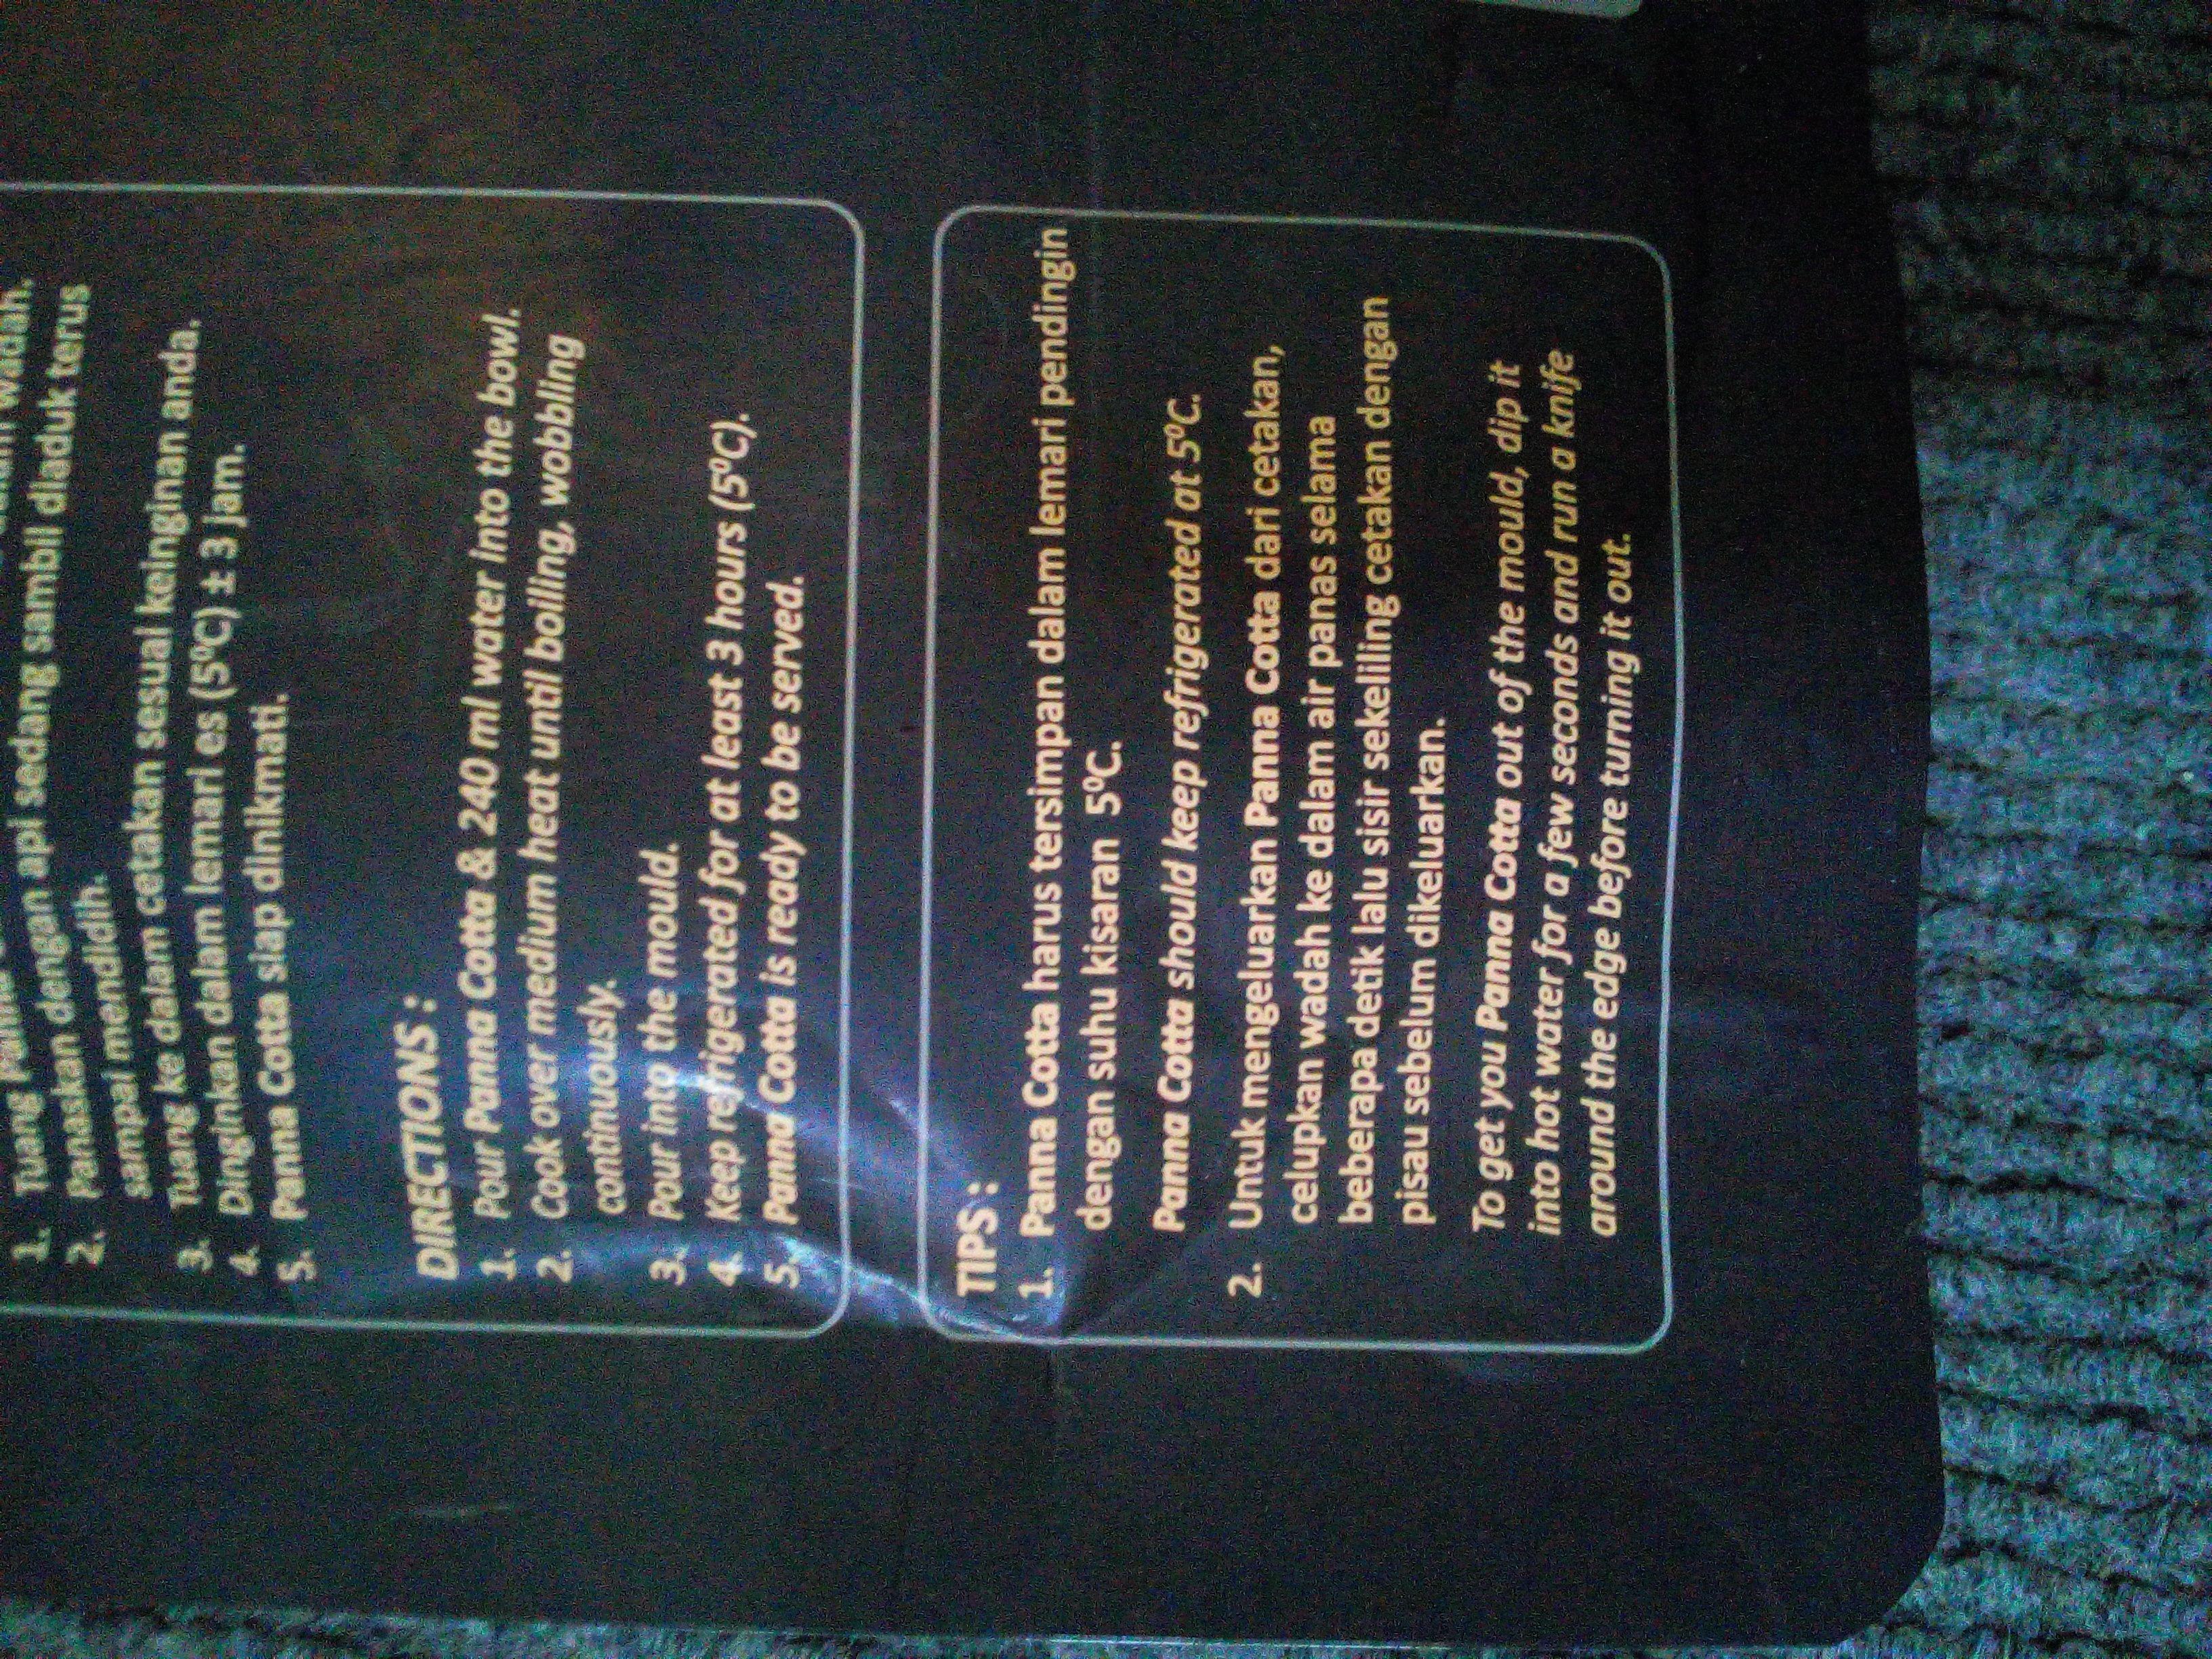 gambar review ke-3 untuk Omura Panna Cotta - Rasa Coklat